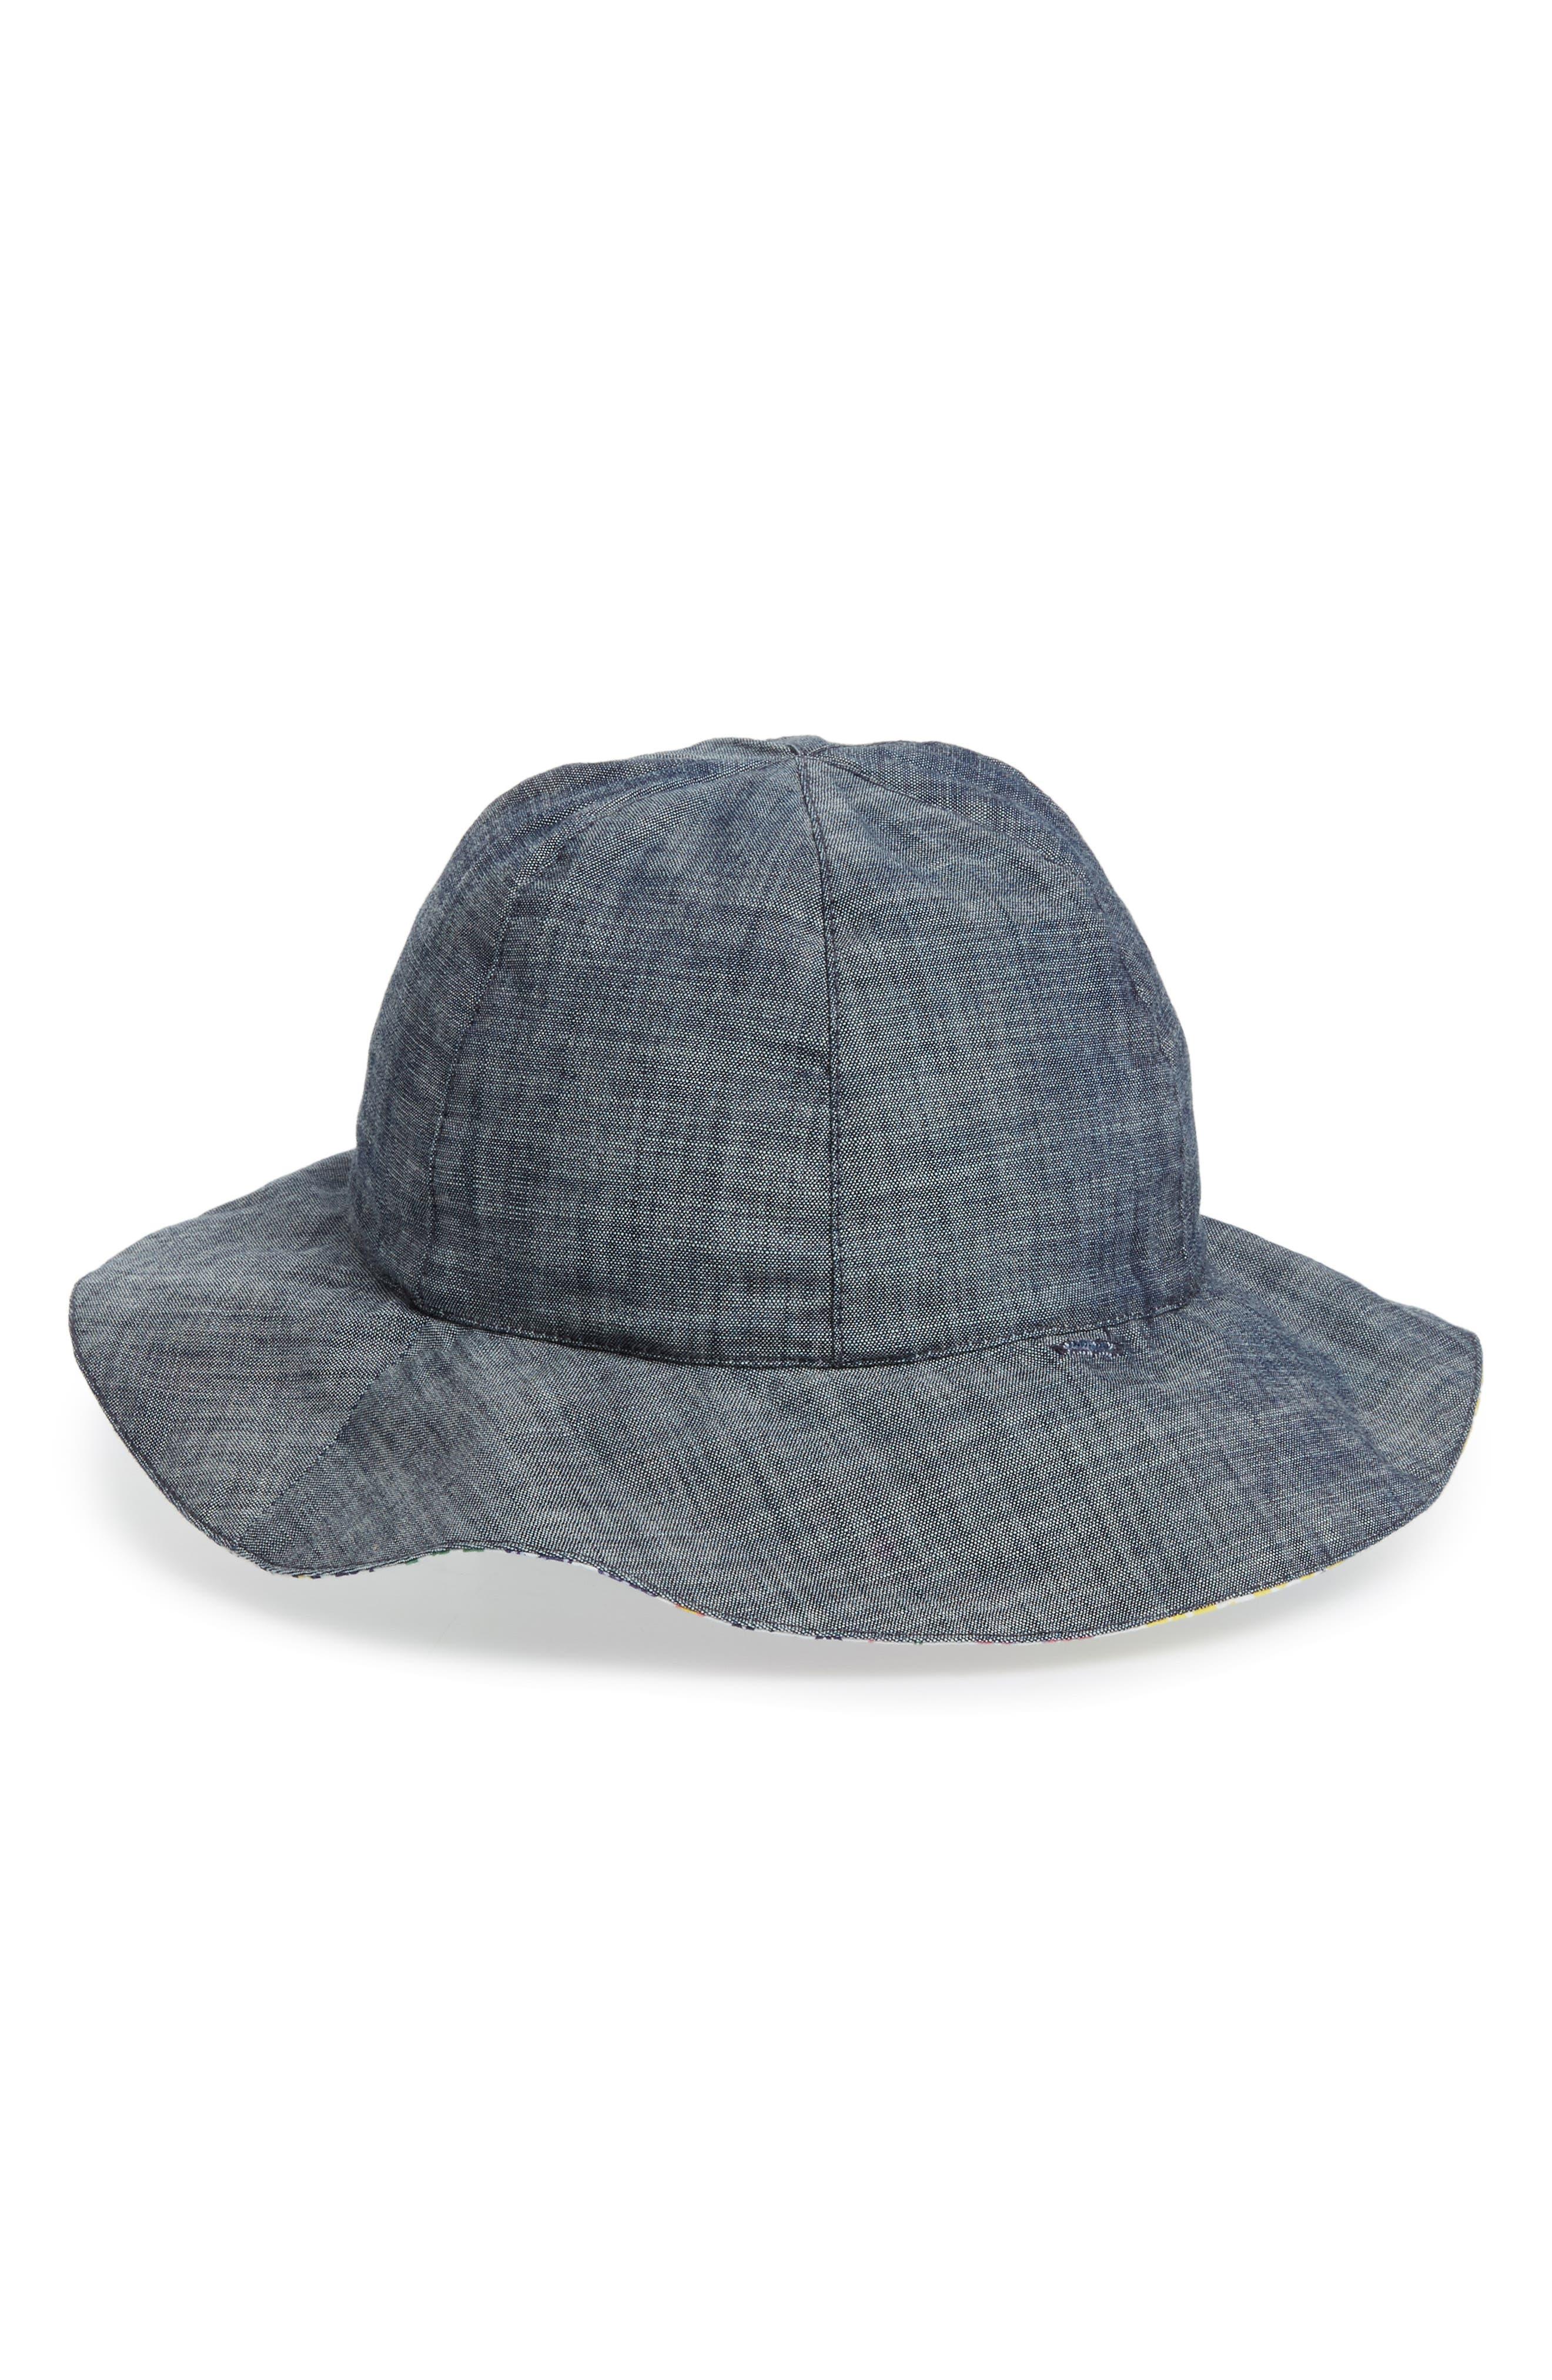 Reversible Sun Hat,                             Main thumbnail 1, color,                             WHITE MULTI MEADOW